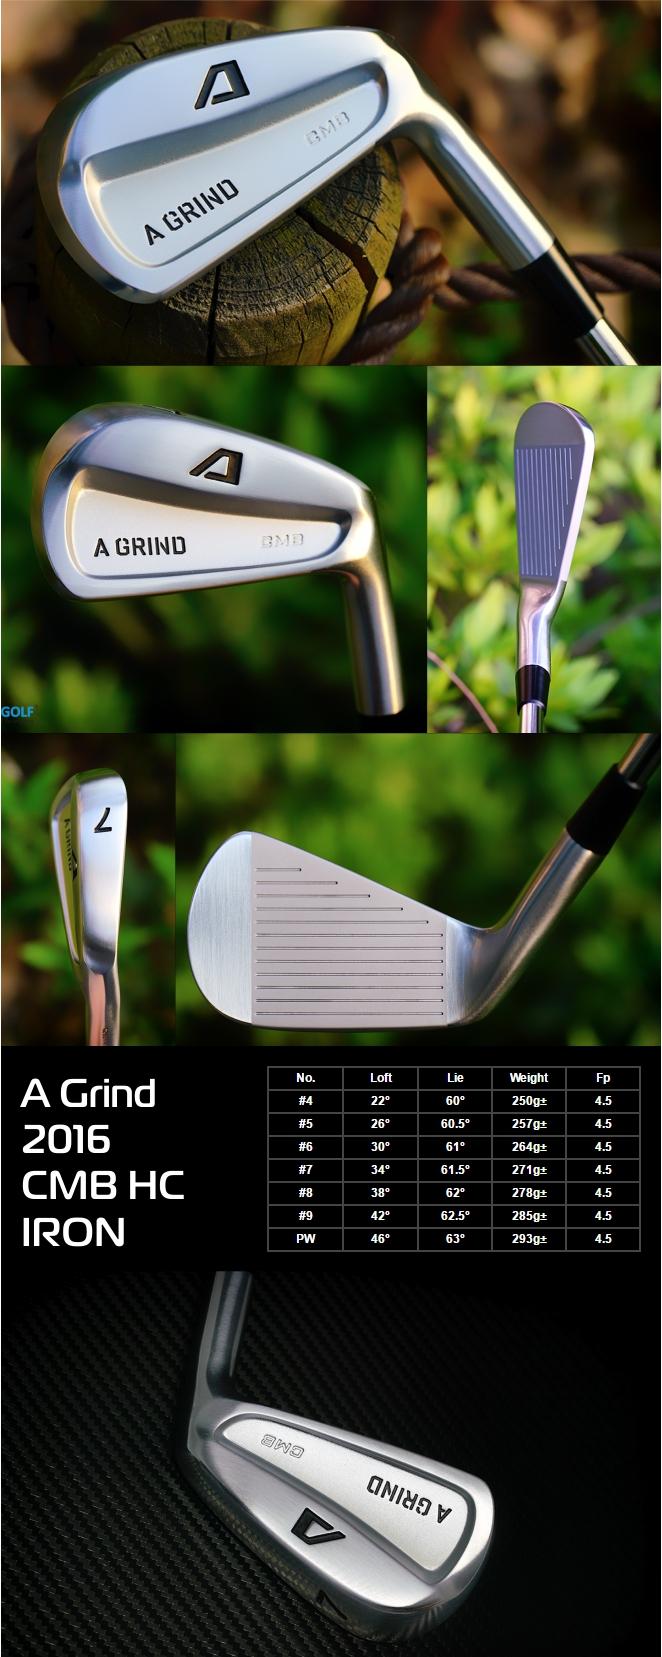 A-Grind 2016 CMB HC Iron